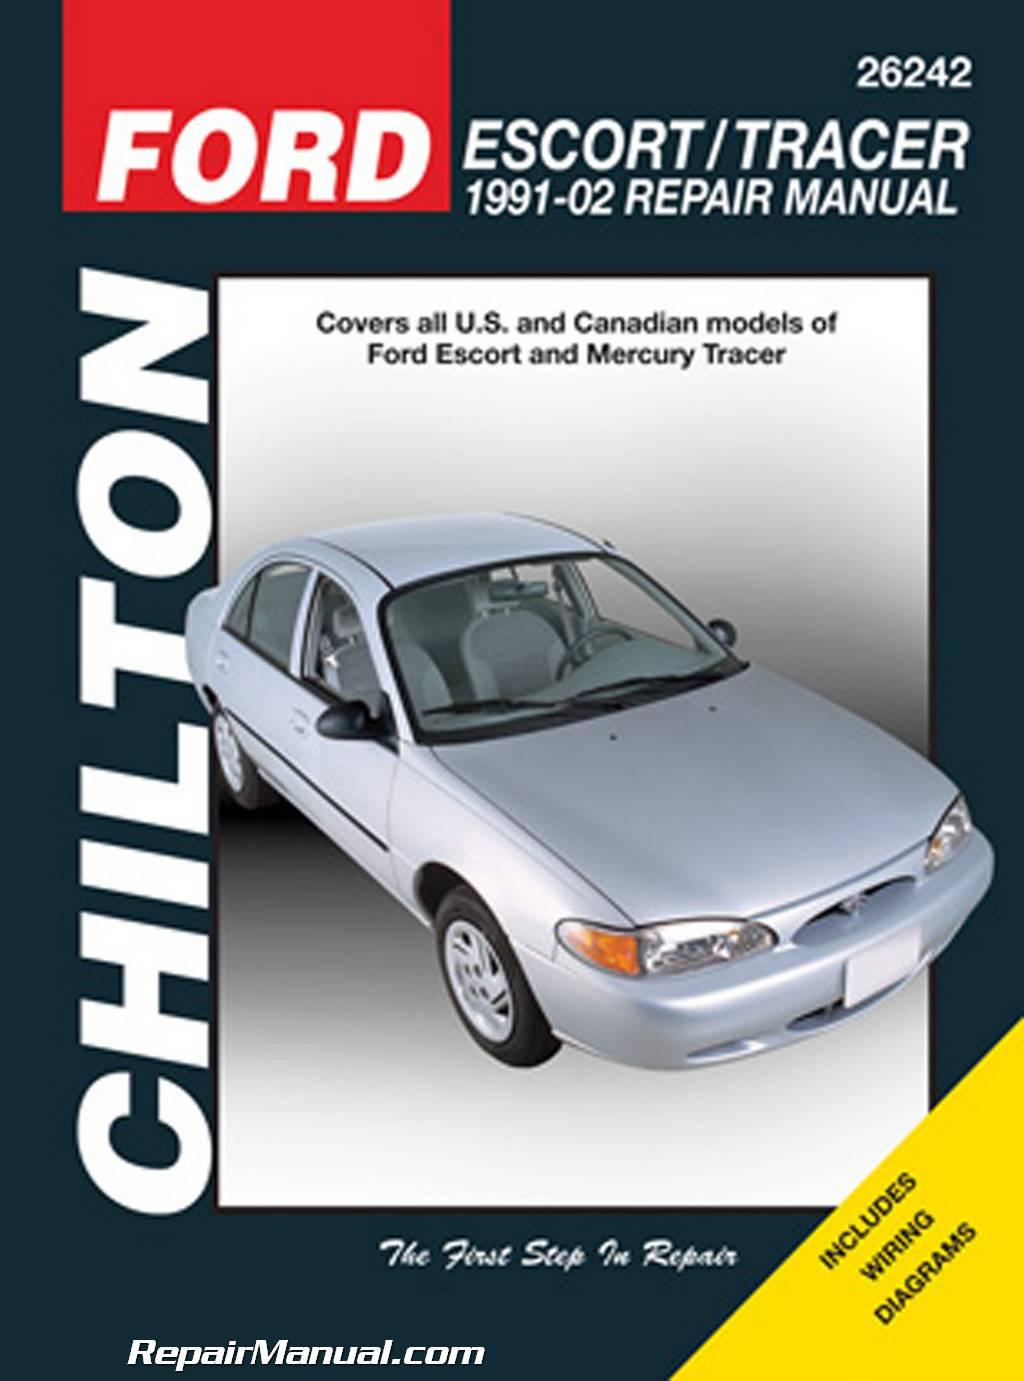 Chilton Ford Escort & Tracer, 1991-2002 Repair Manual